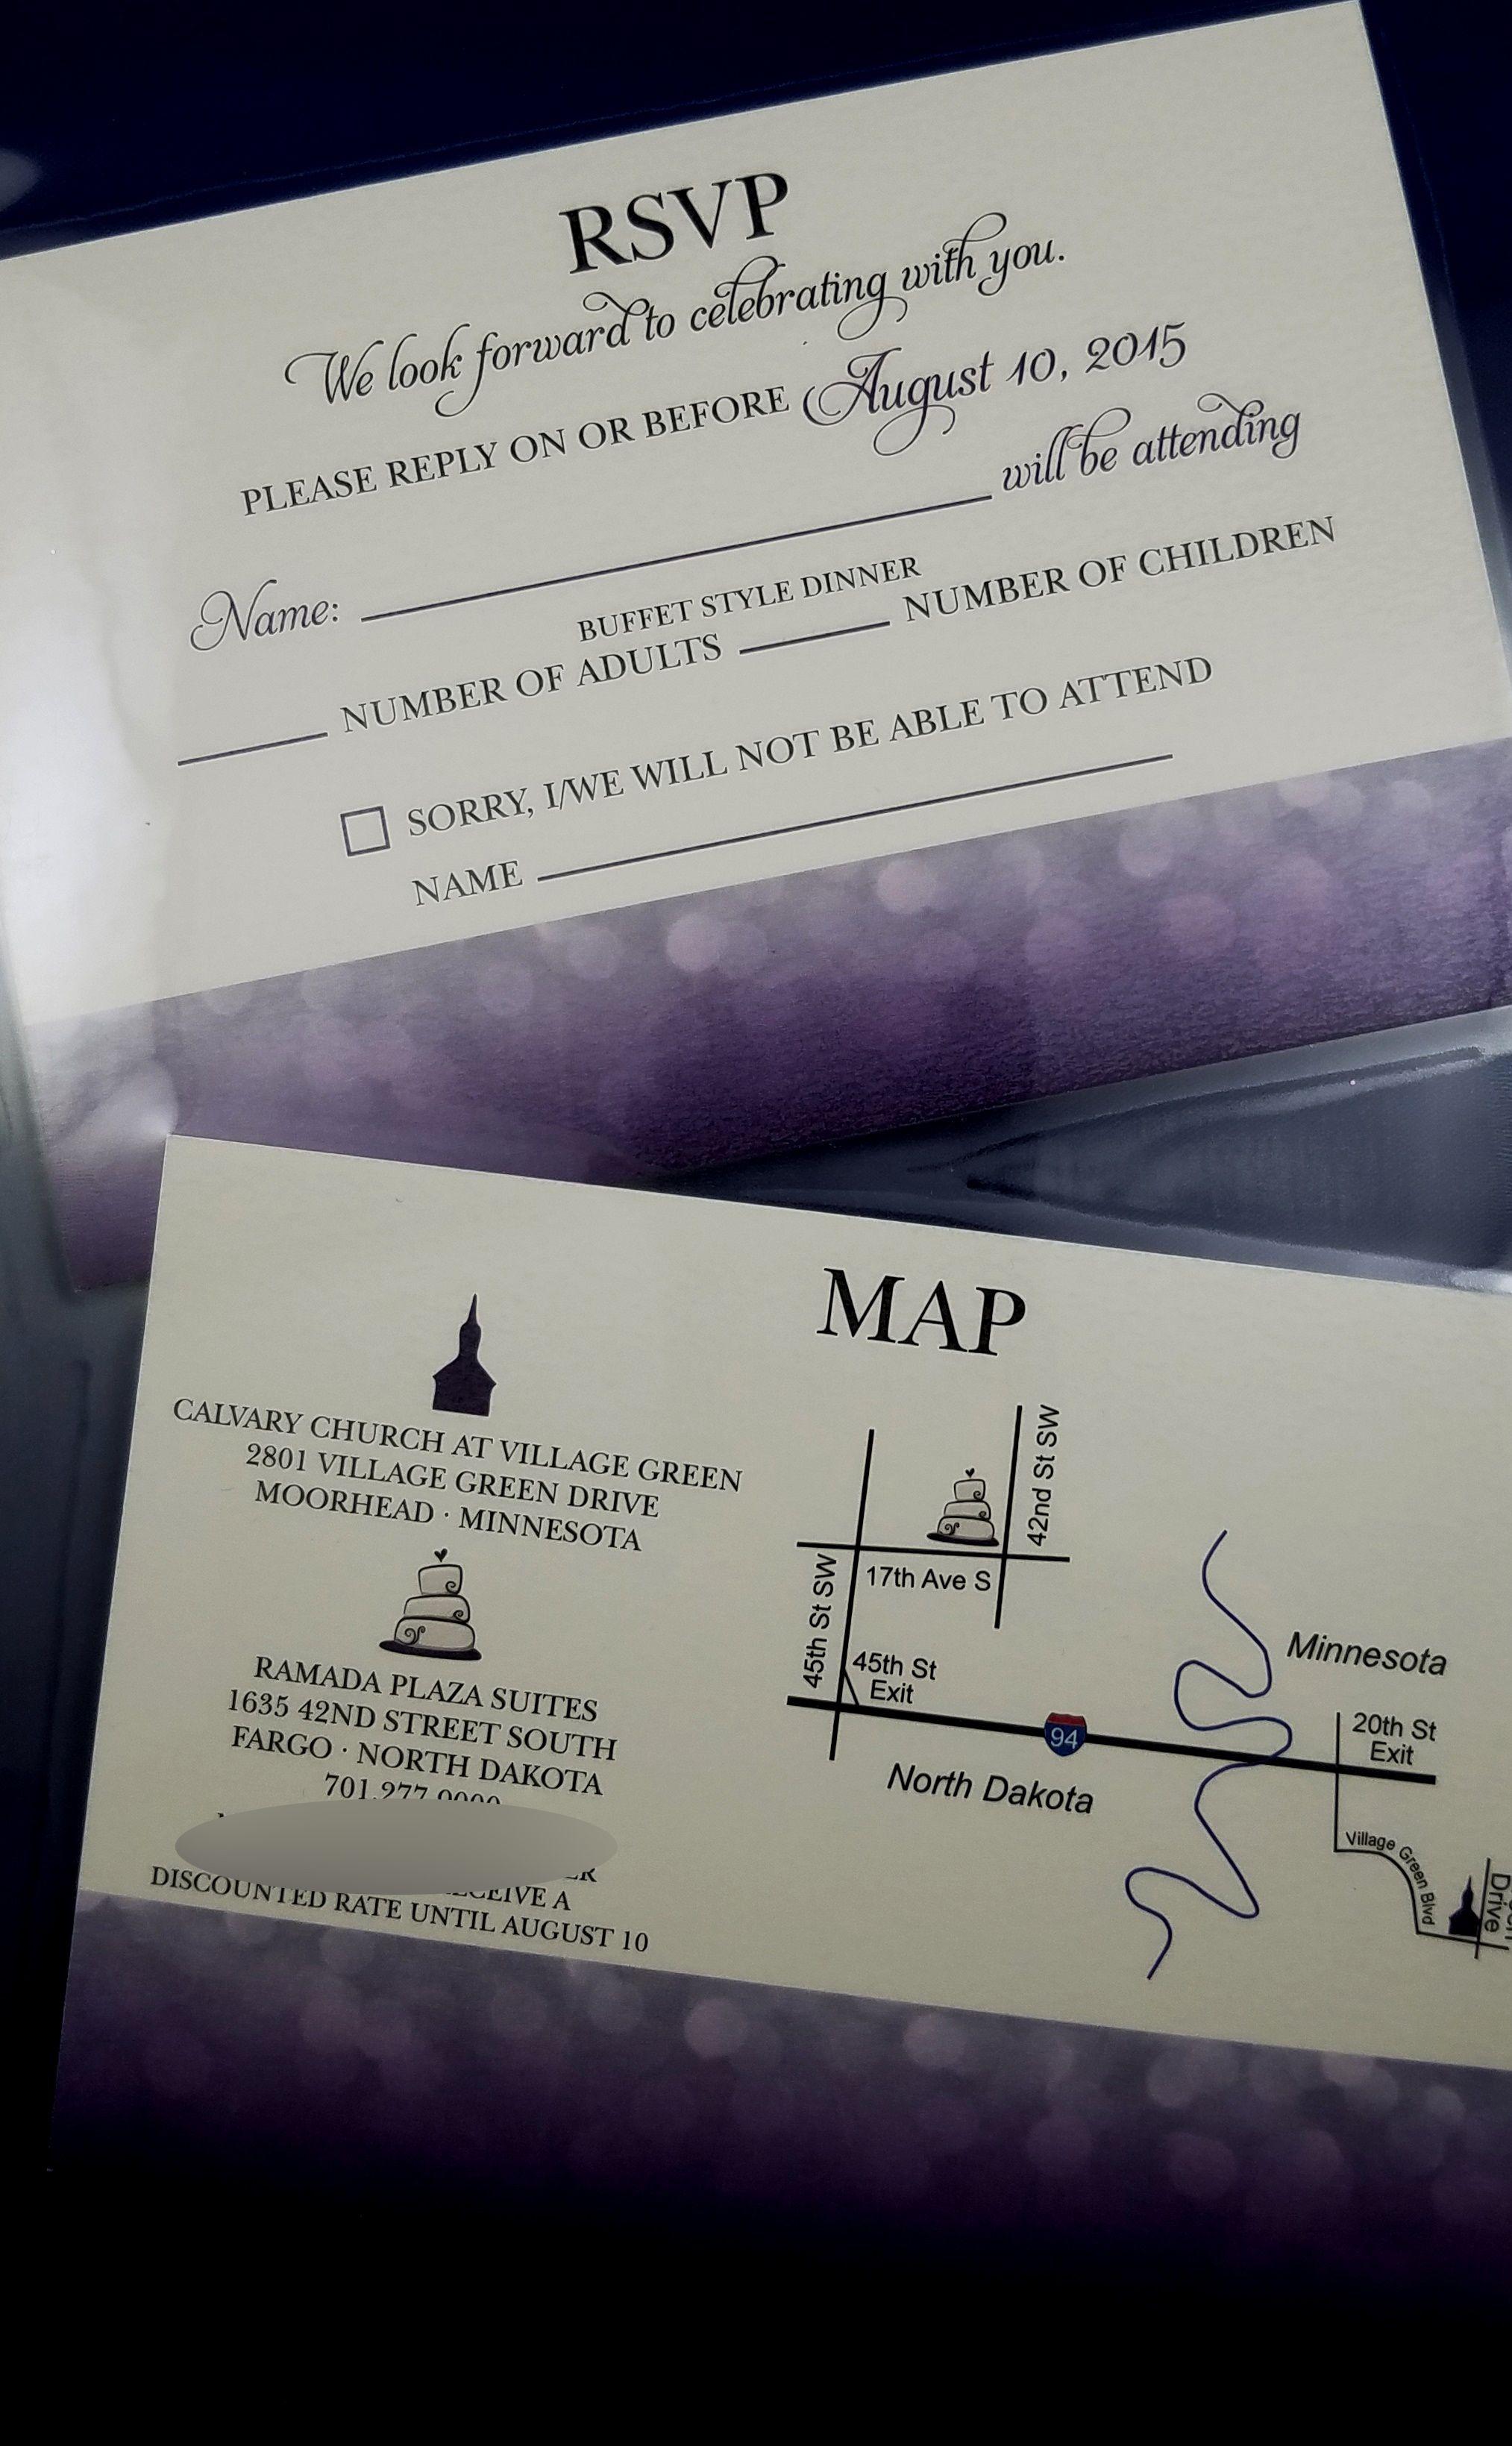 Purple Rsvp with map Wedding rsvp, Rsvp, Buffet style dinner